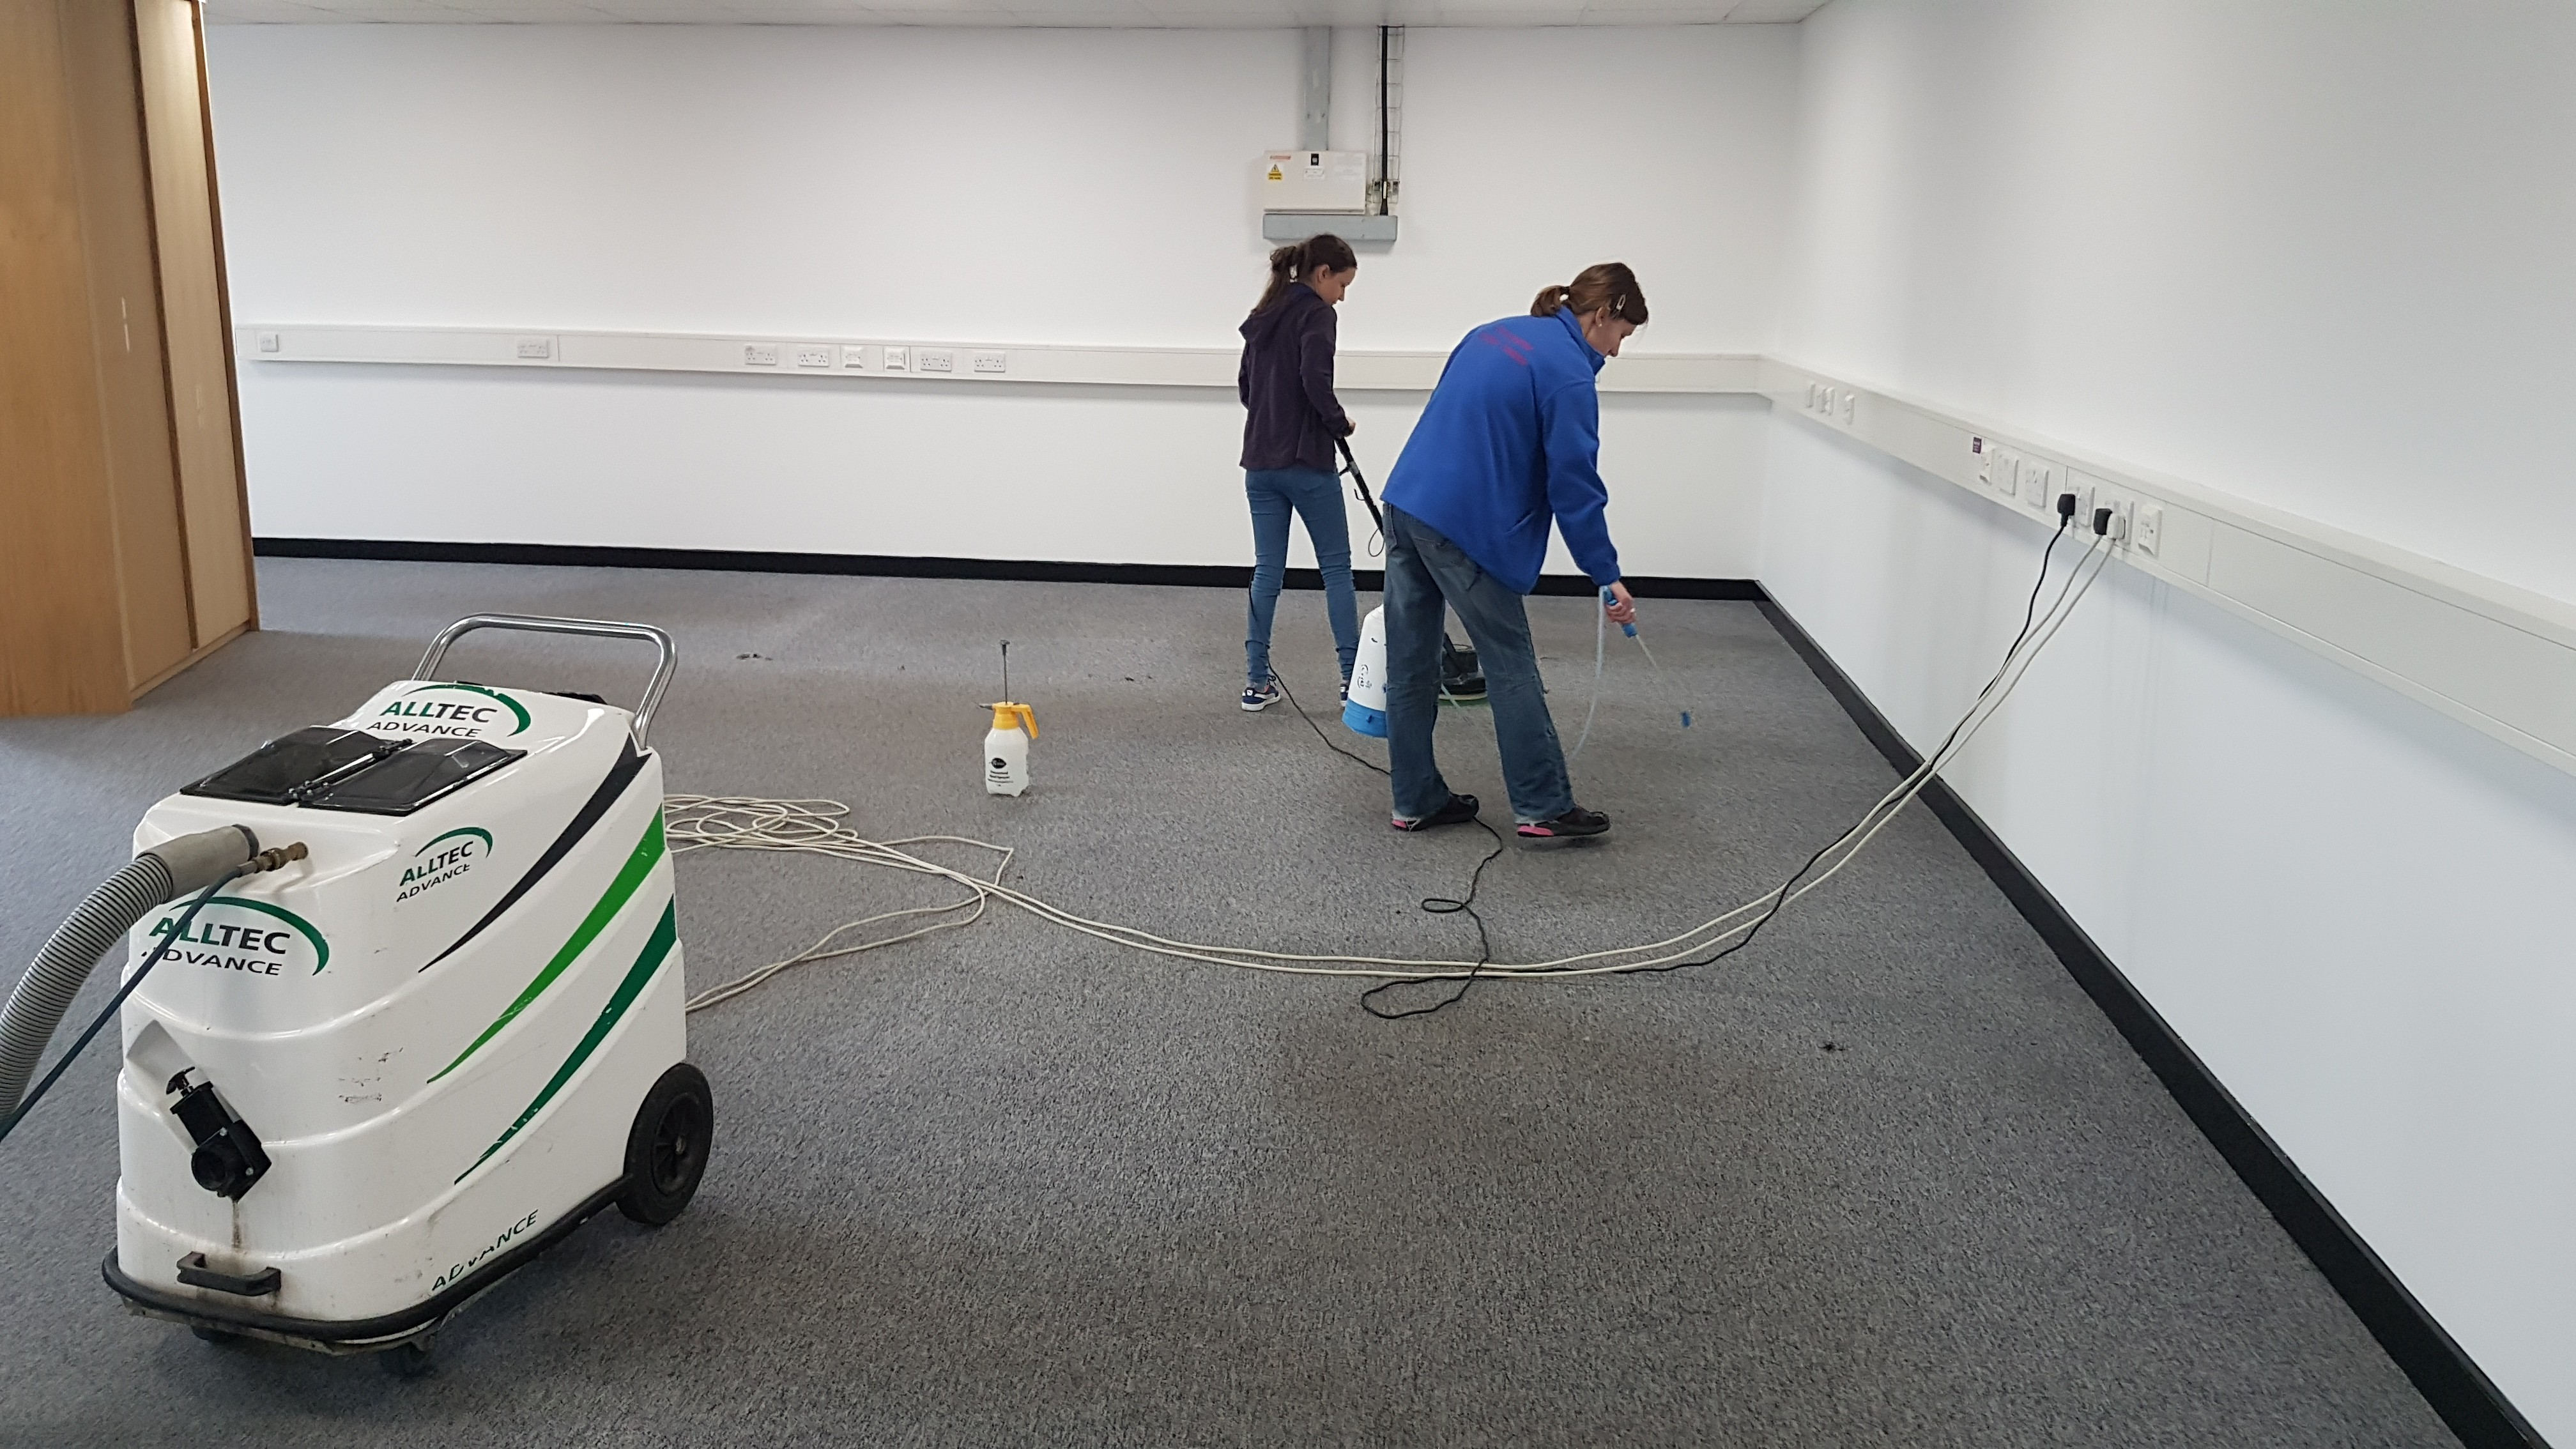 Commercial Carpet Cleaning Service Doncaster Doncaster